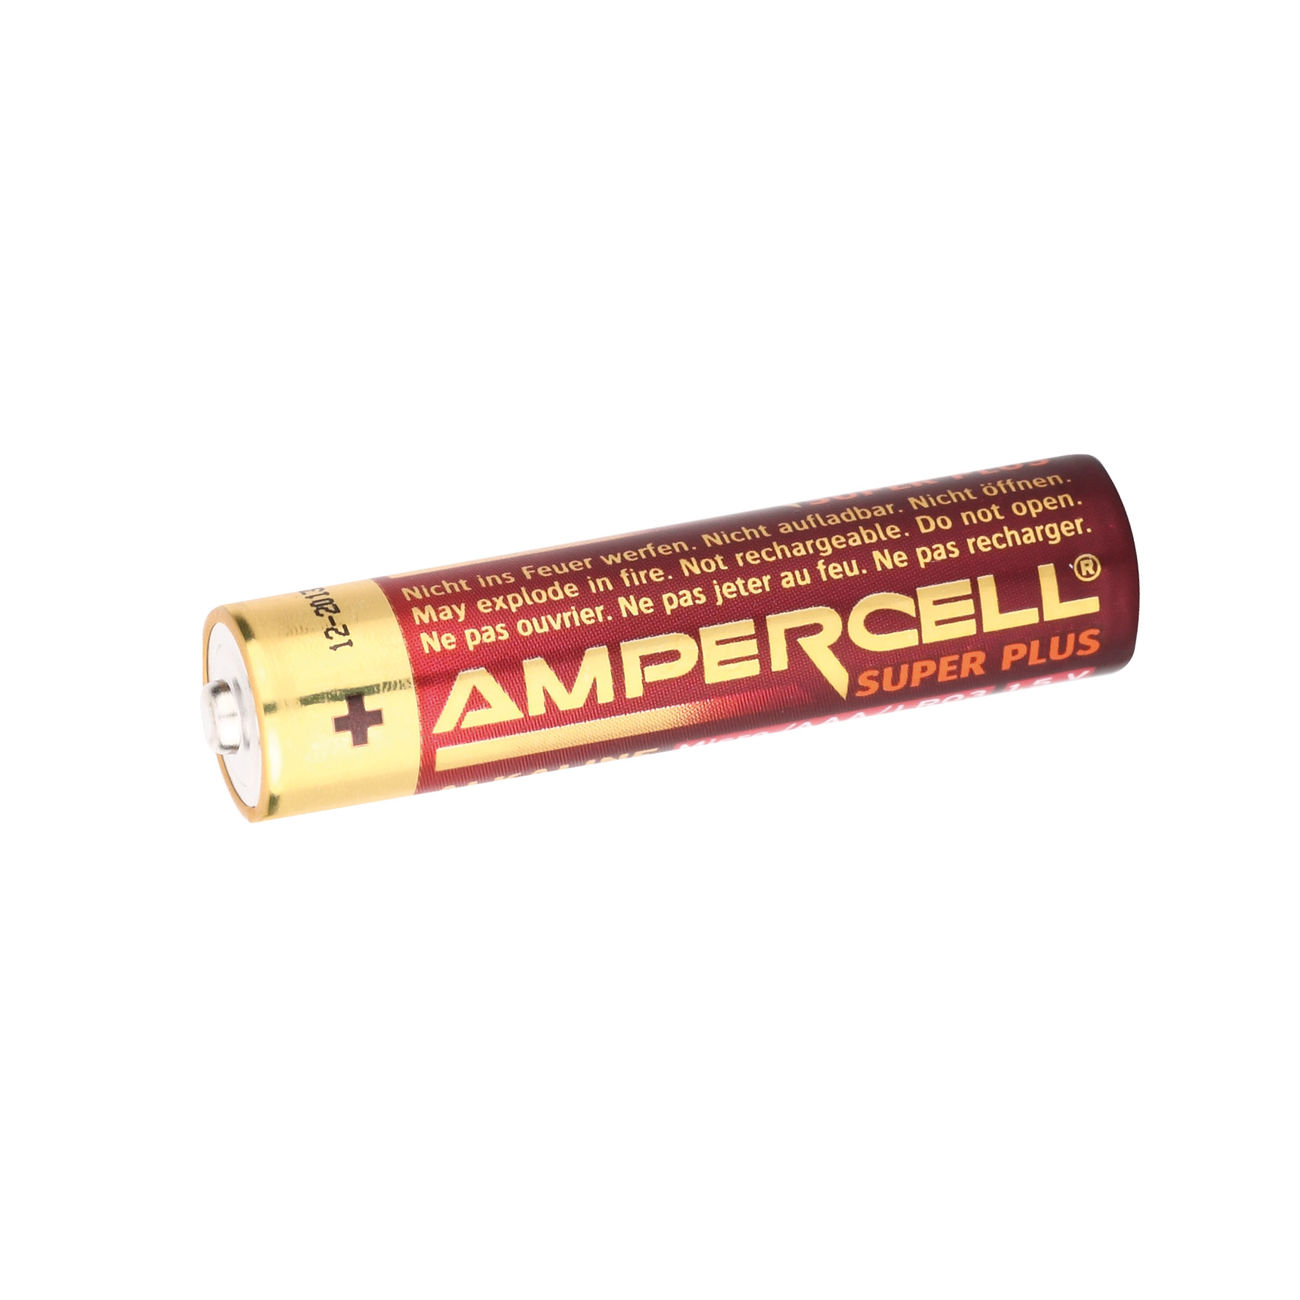 Ampercell Batterien Super Plus Micro AAA/LR03 1,5V